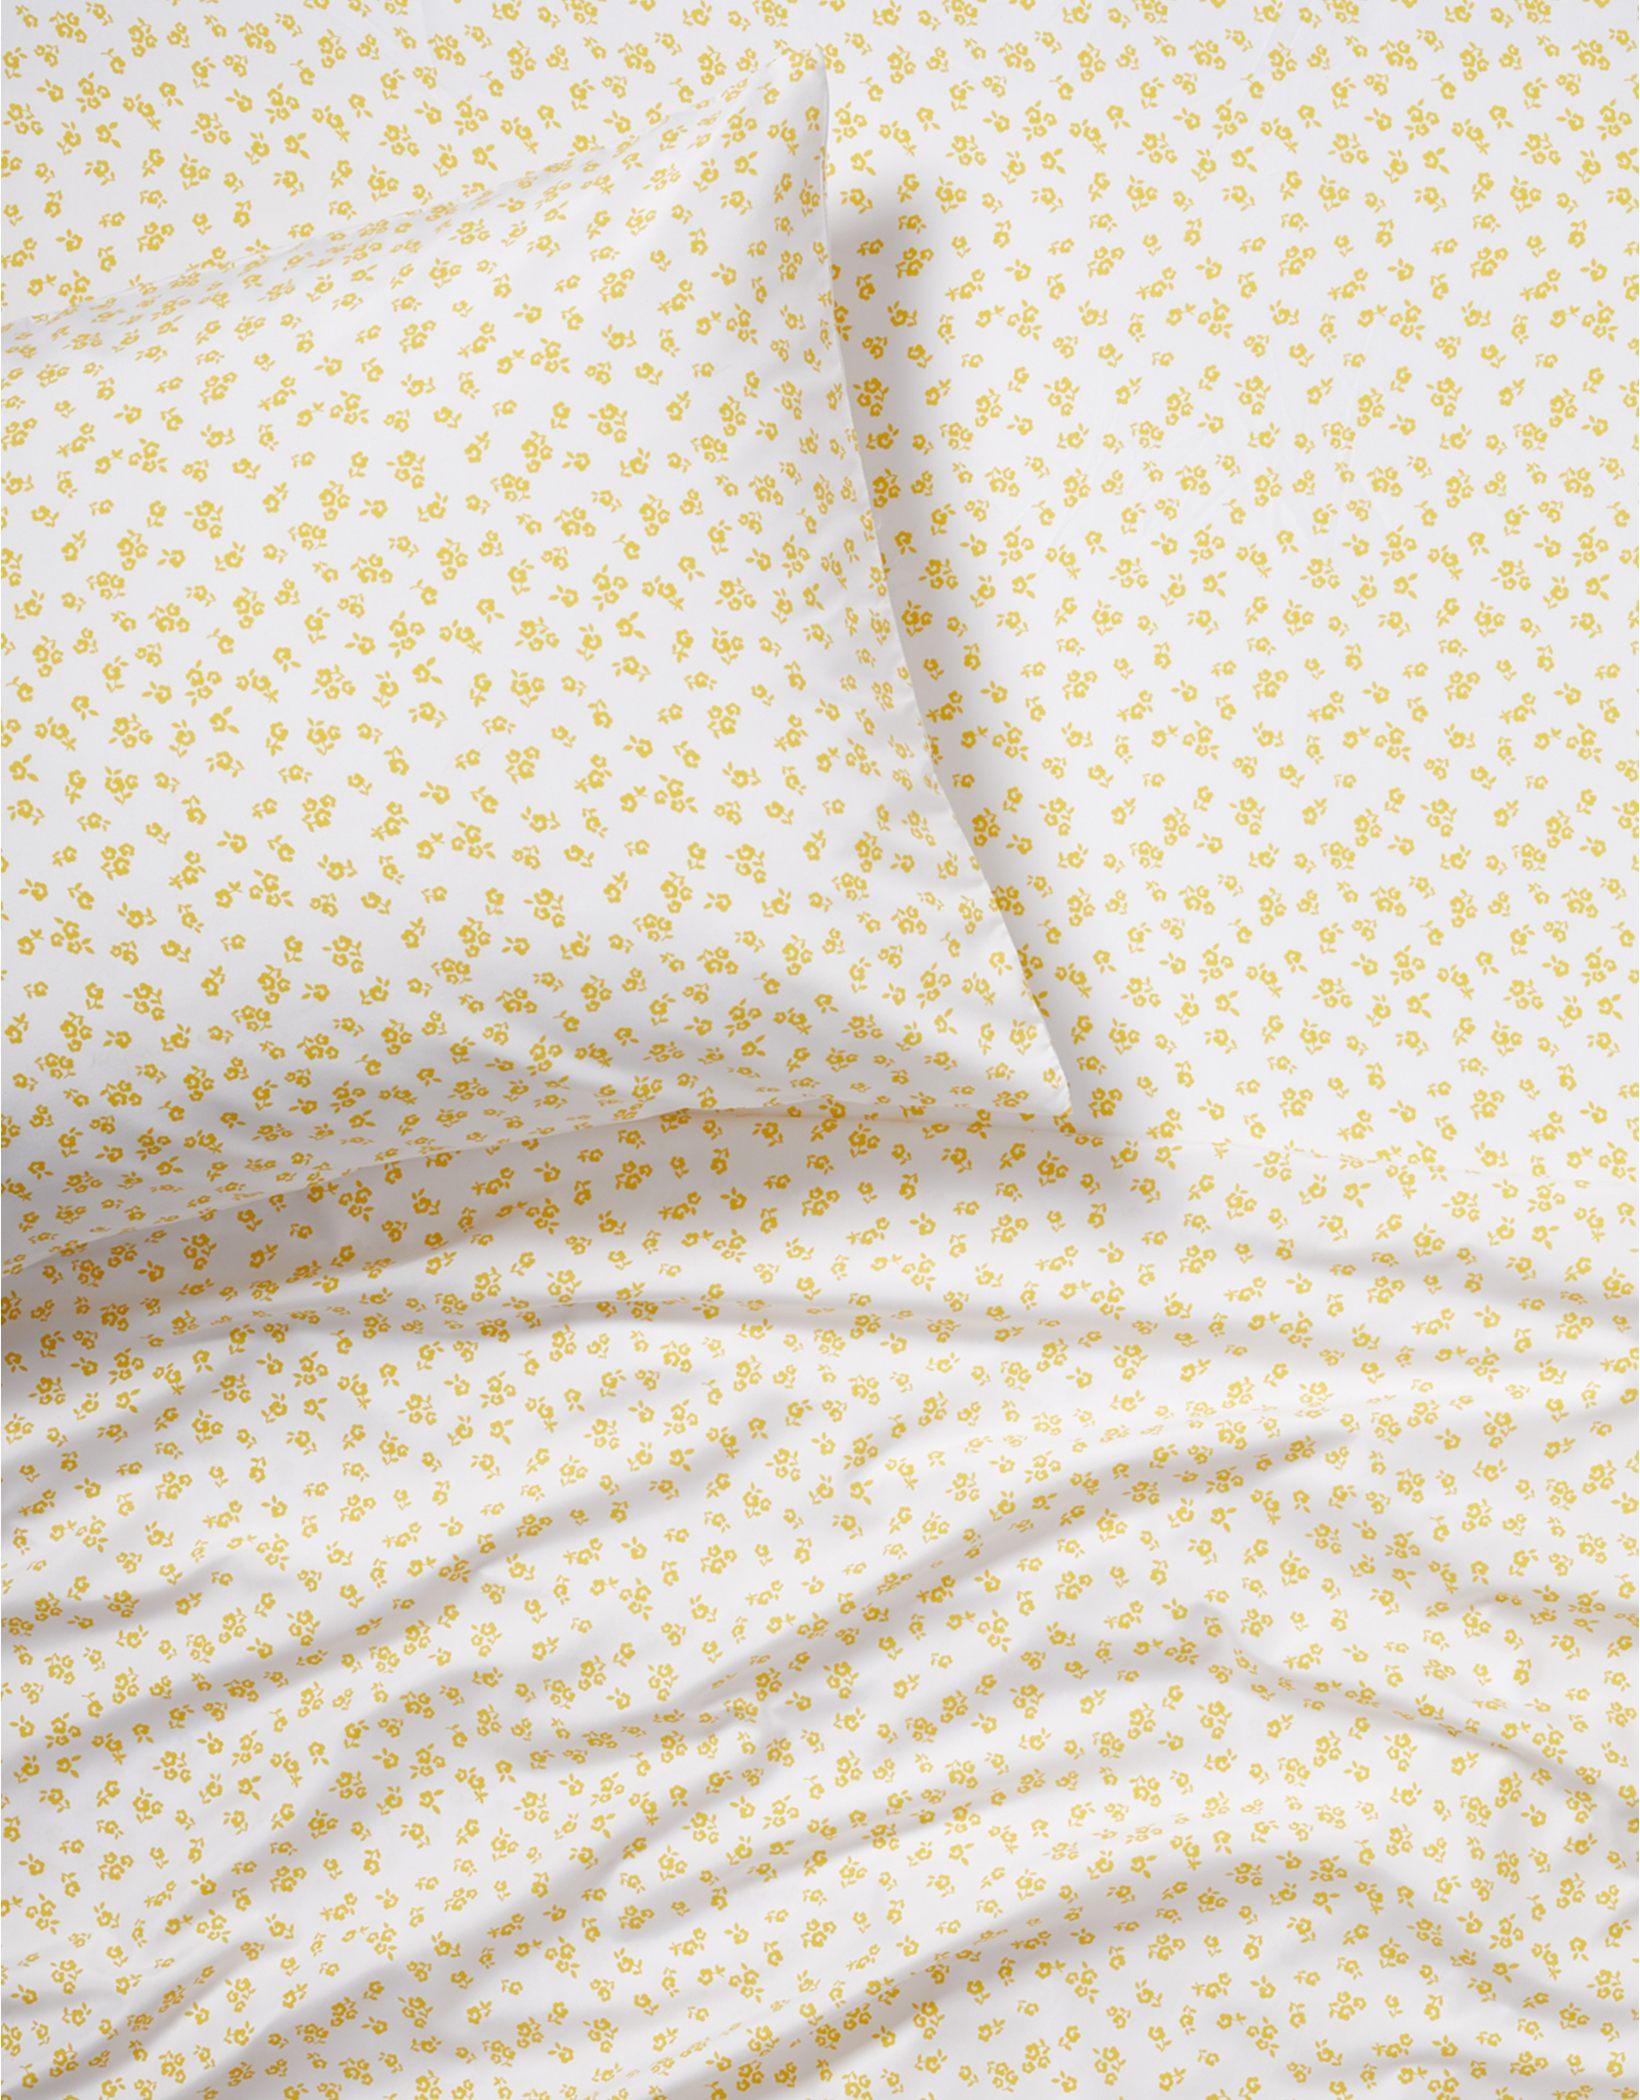 Dormify Ditsy Floral Twin XL Microfiber Sheet Set